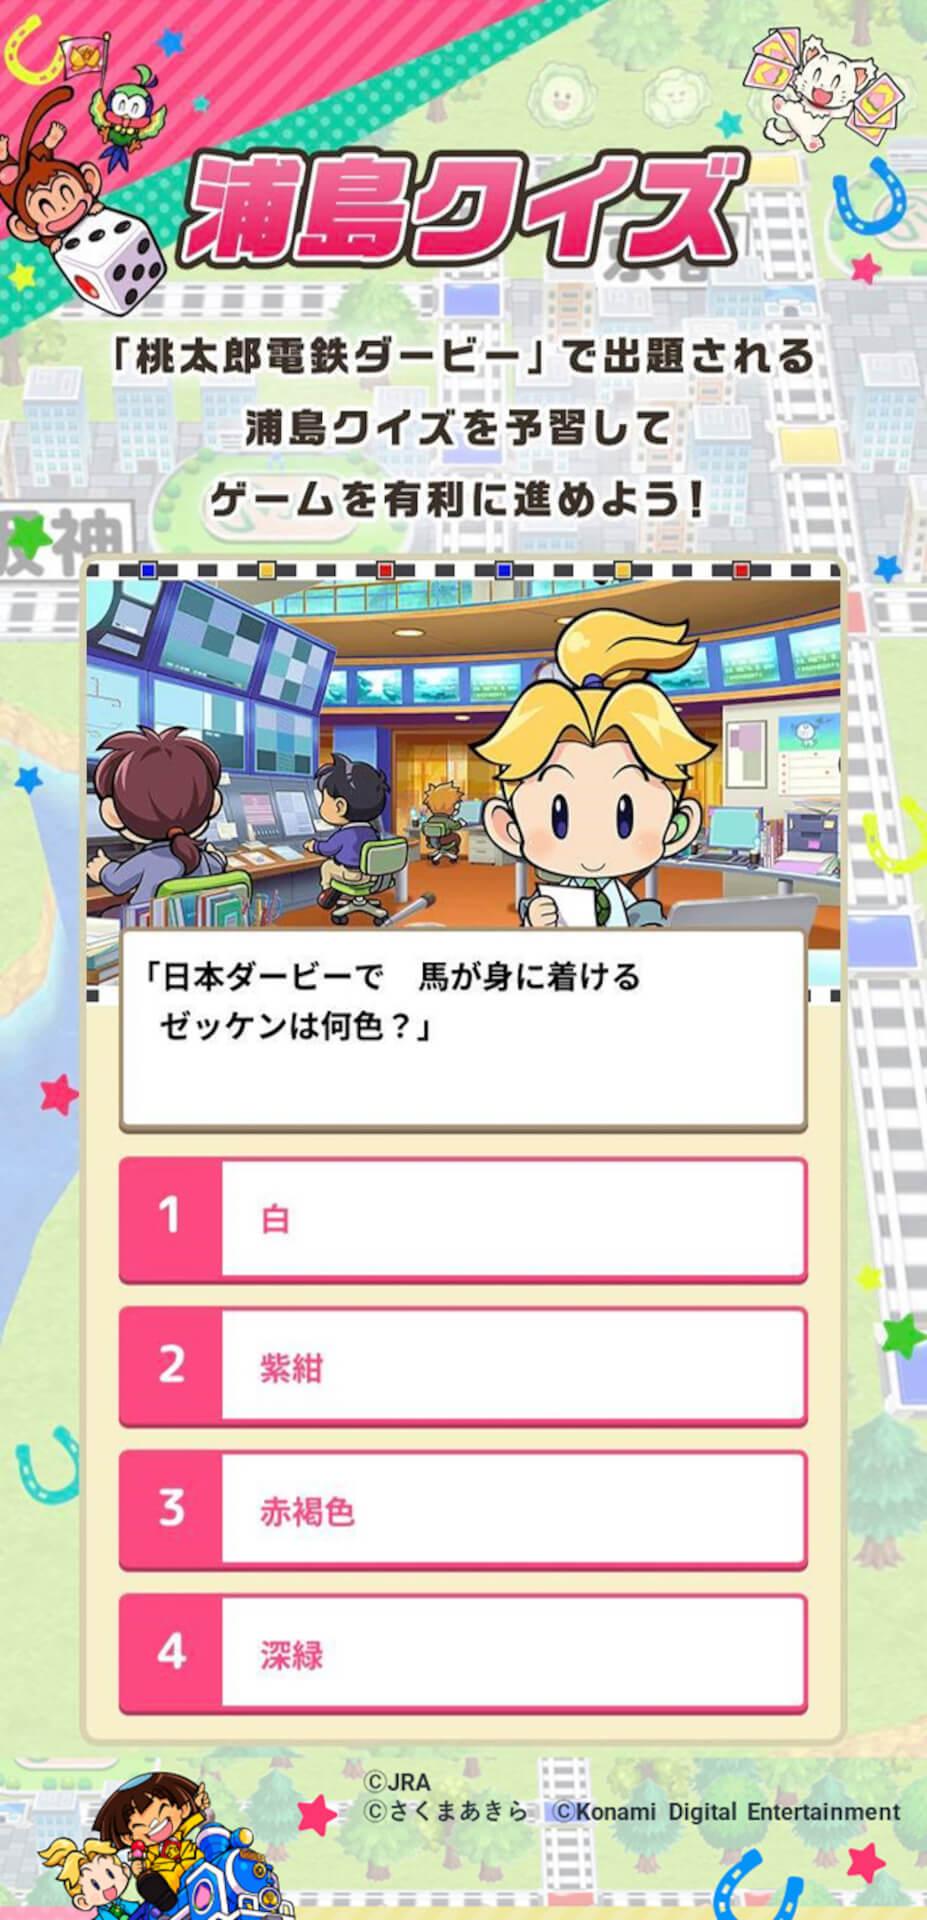 JRAと桃太郎電鉄が日本ダービーでコラボ!1万円分の電子マネーギフトが当たるTwitterキャンペーンも実施 tech210517_jra-momotetsu-210517_2